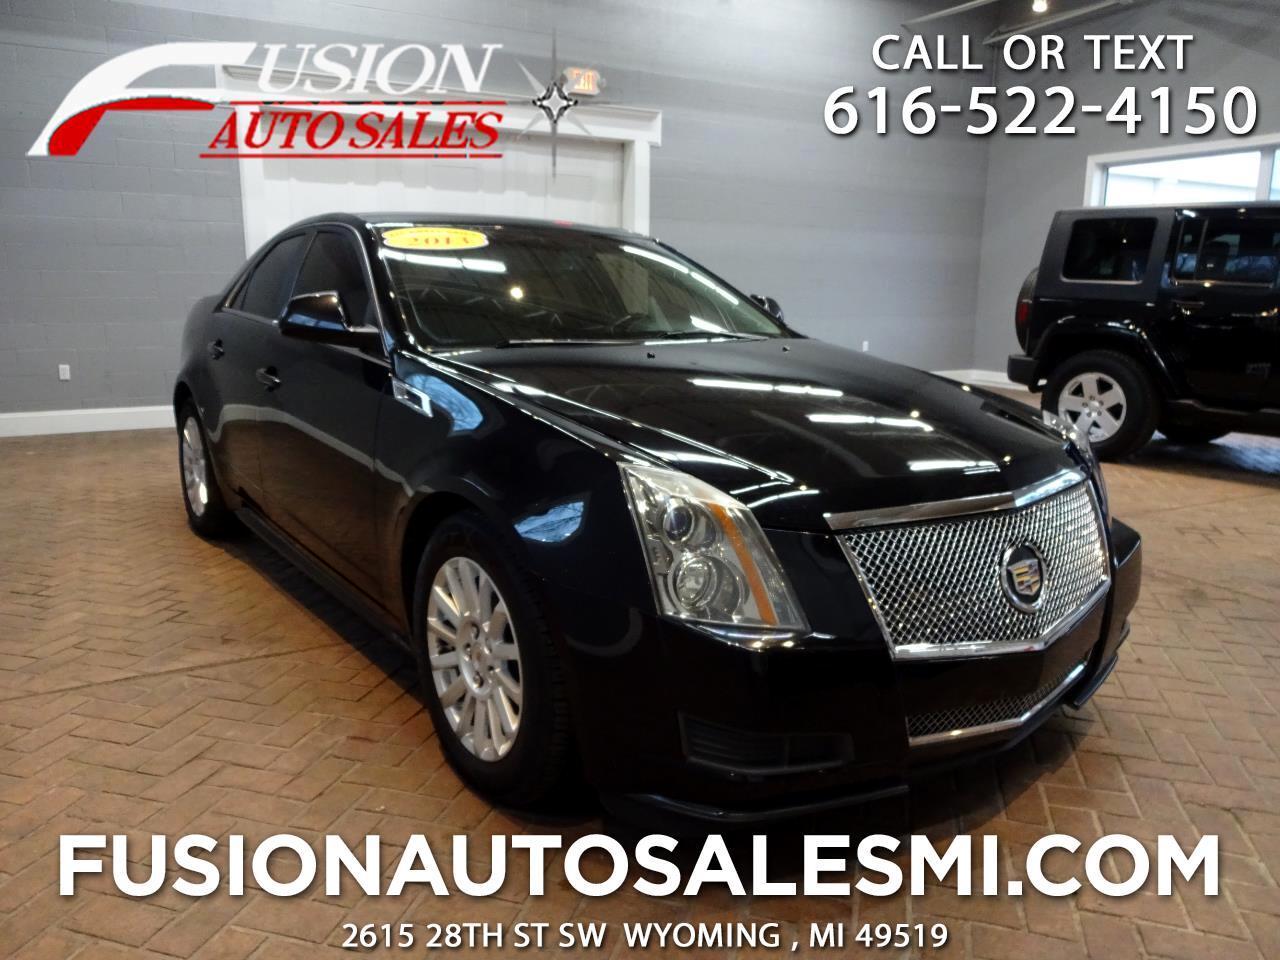 2013 Cadillac CTS Sedan 4dr Sdn 3.0L Luxury AWD